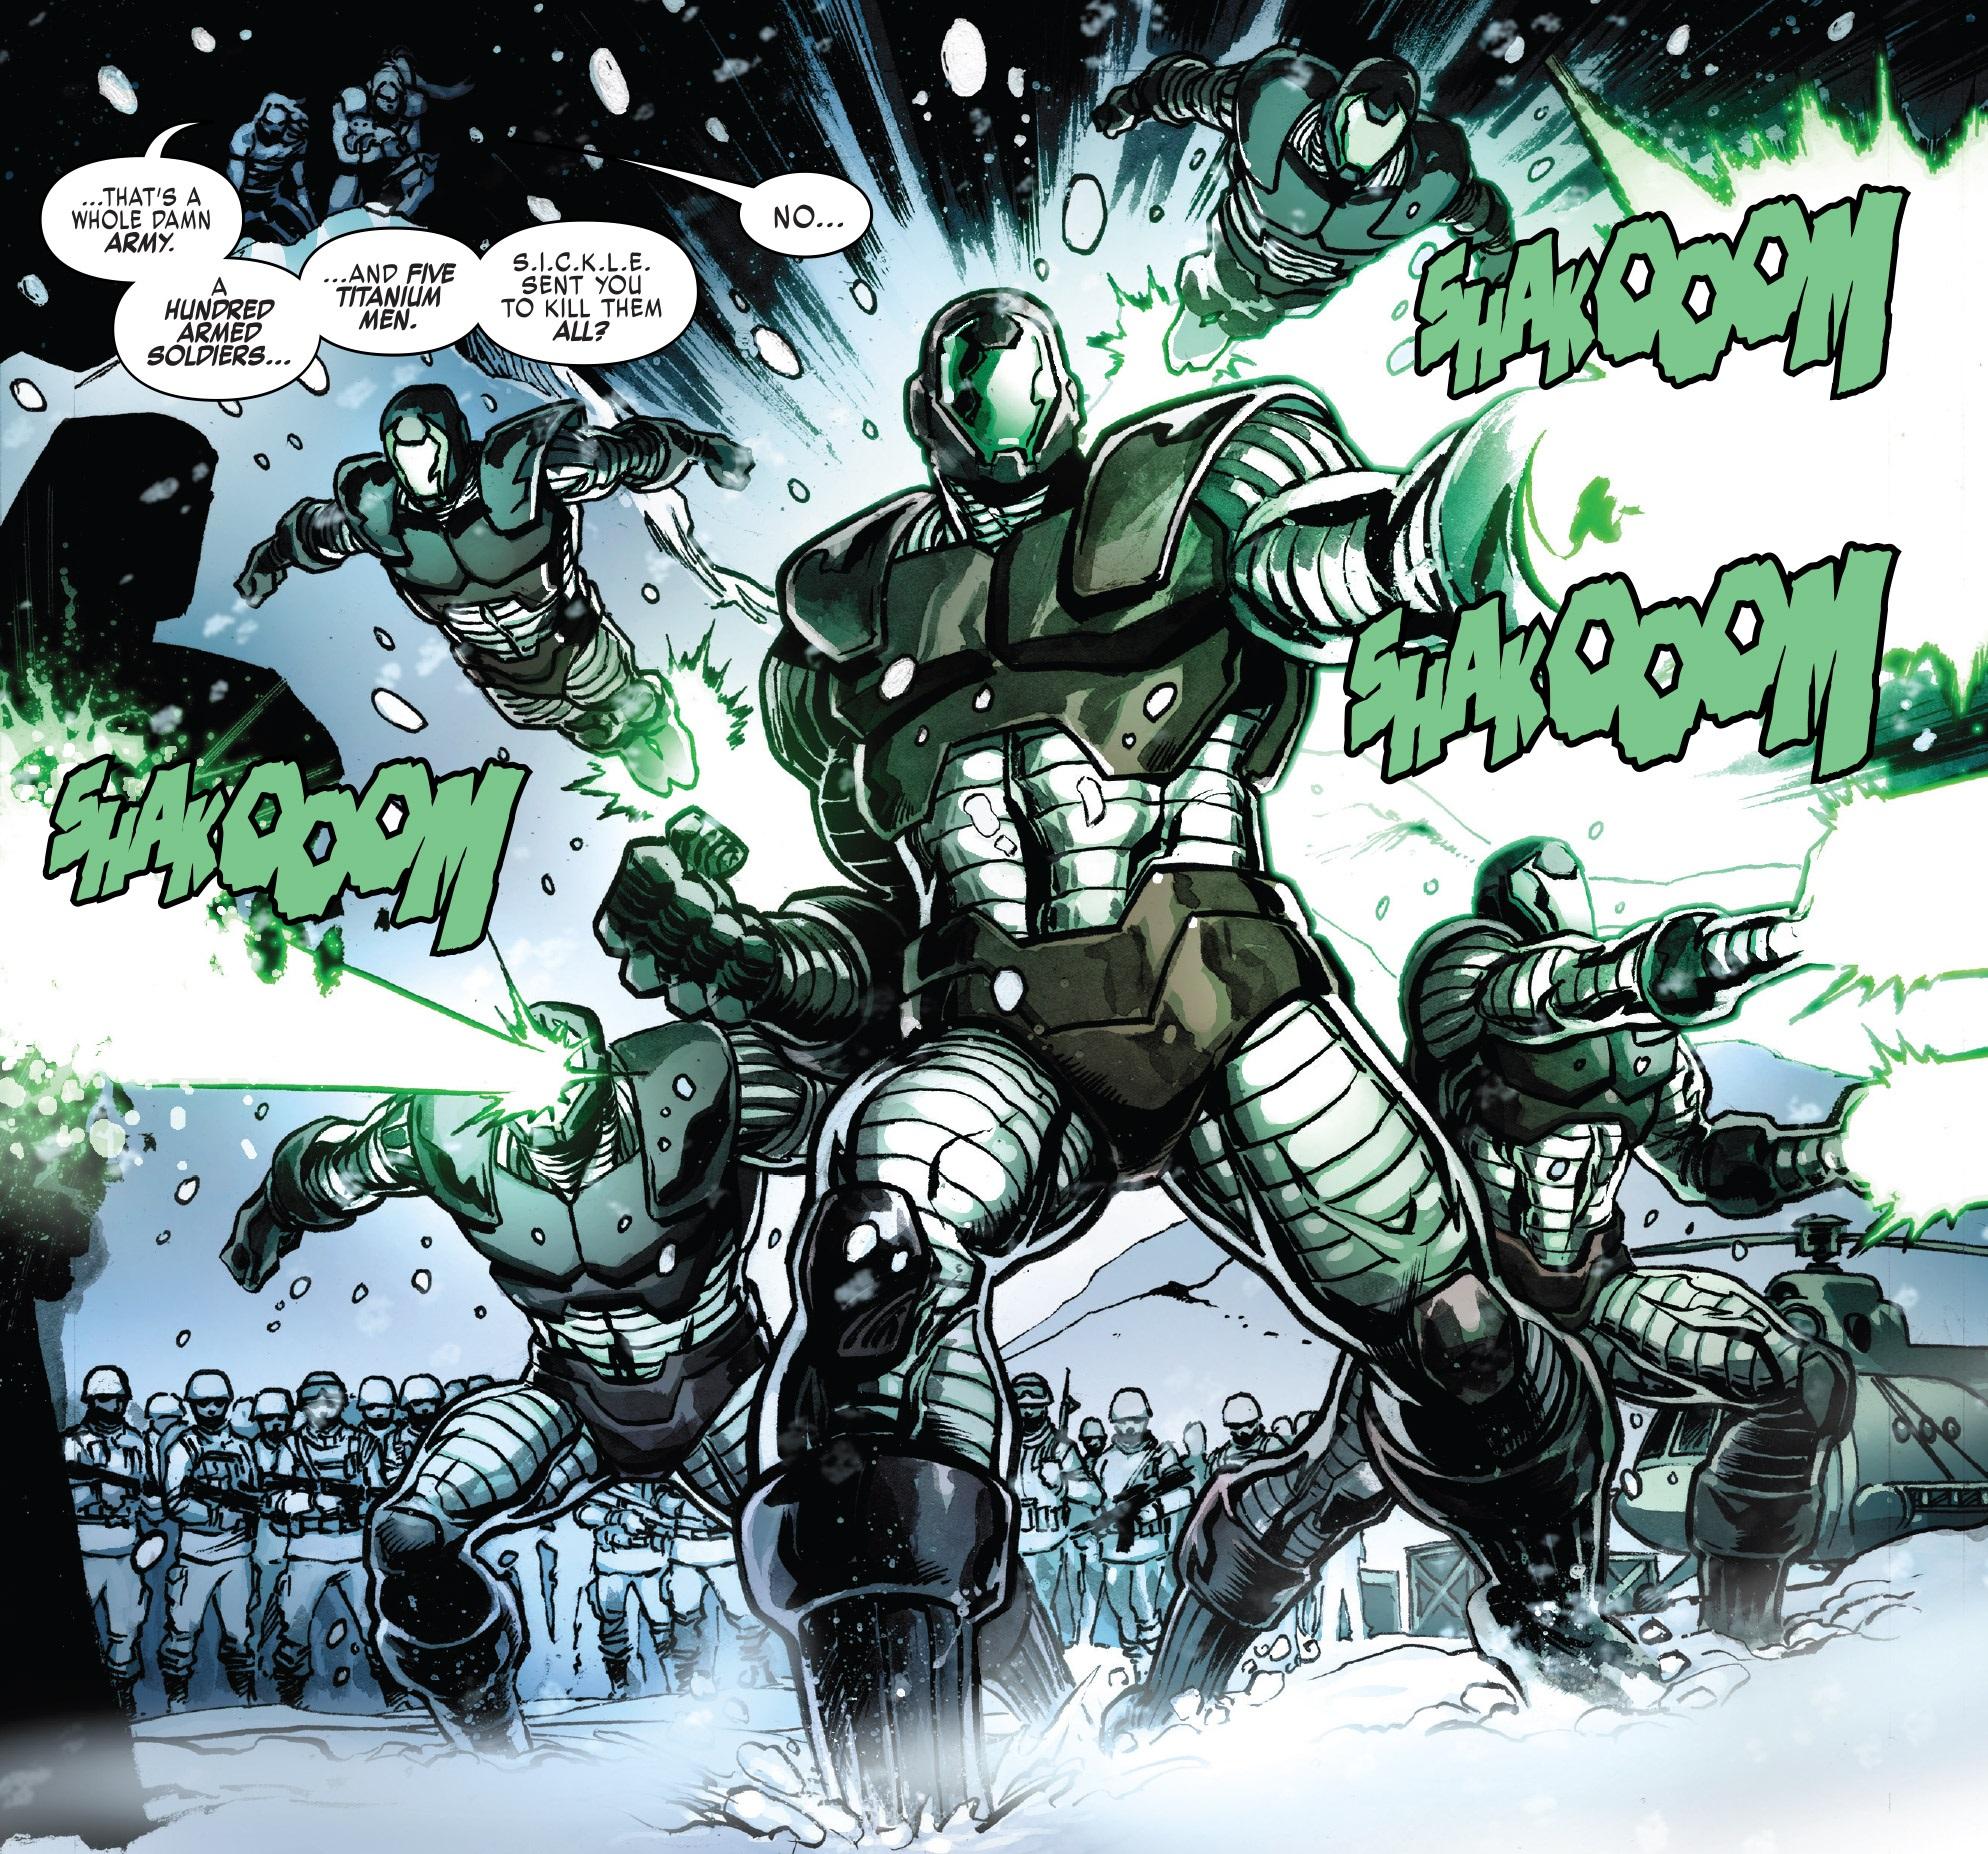 Titanium Man Mutant-Defense Project (Earth-616)/Gallery